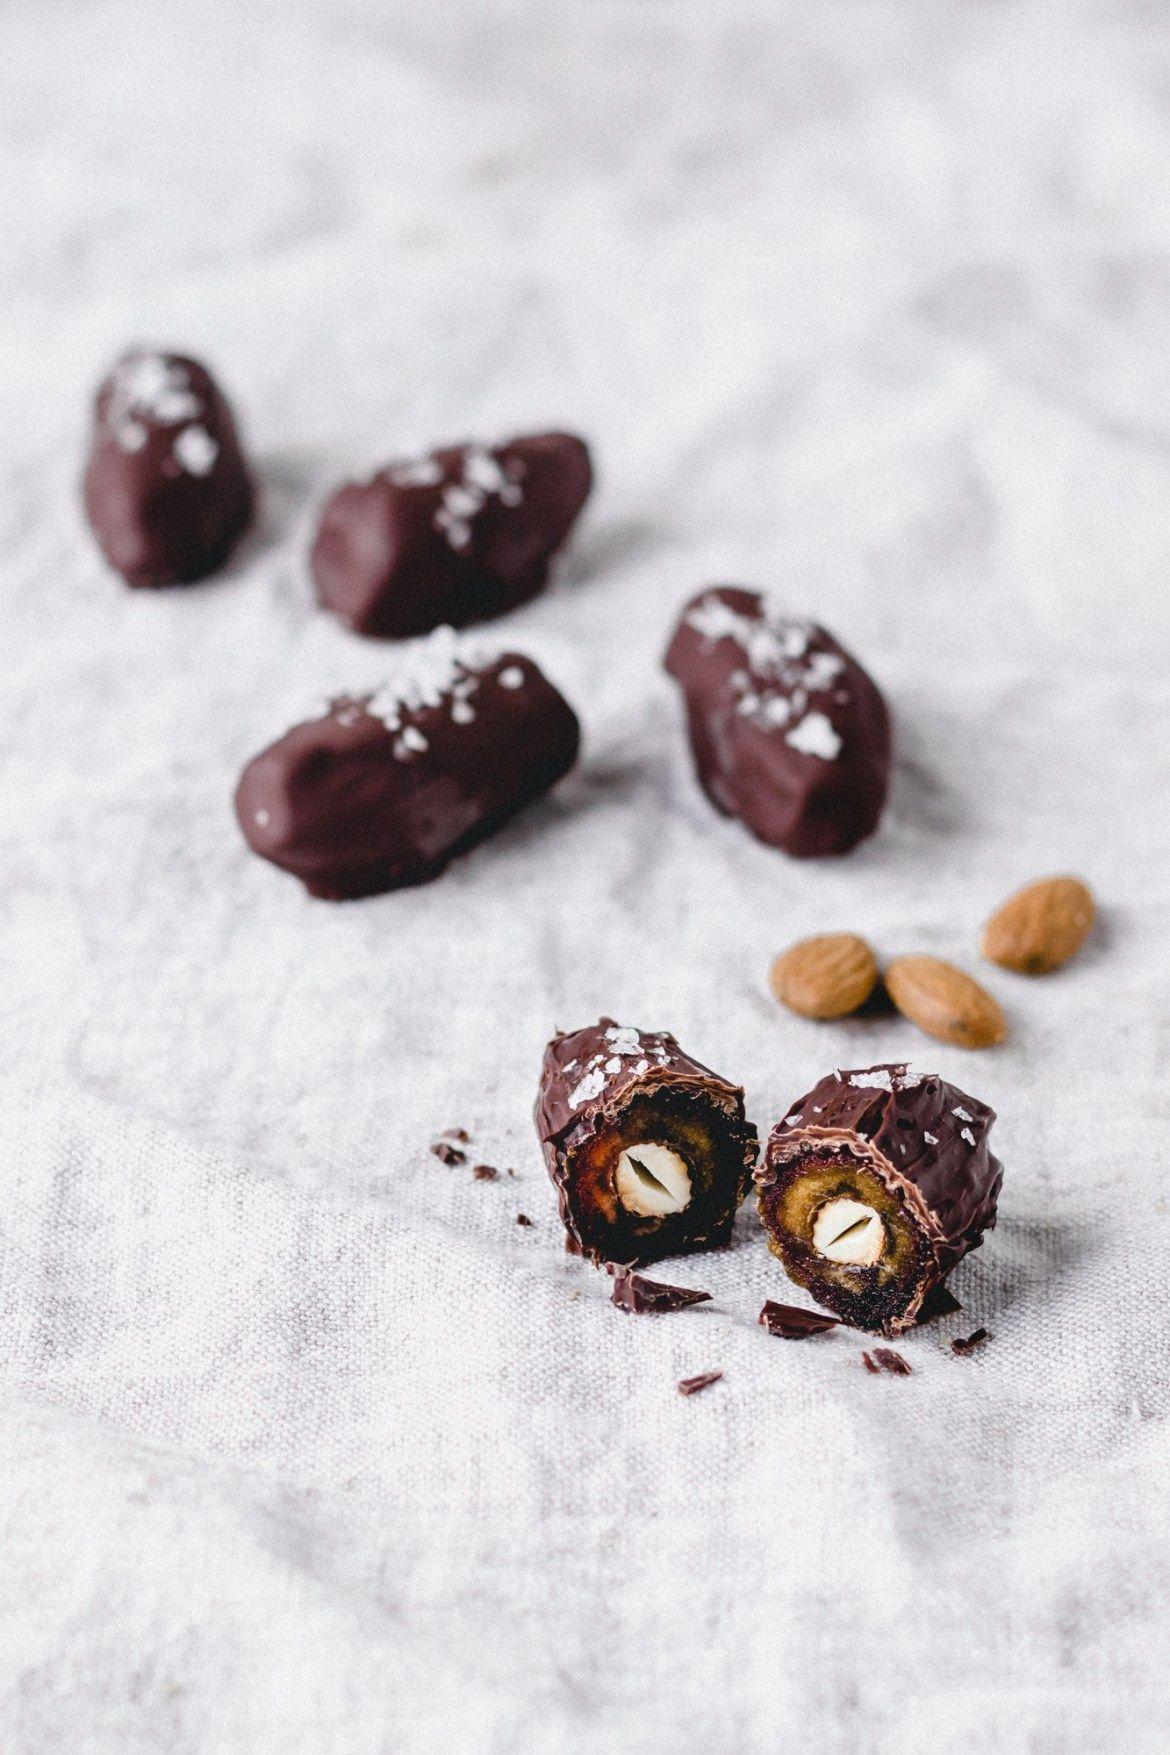 Vegan Salted Dark Chocolate Dates Stuffed With Almonds Recipe